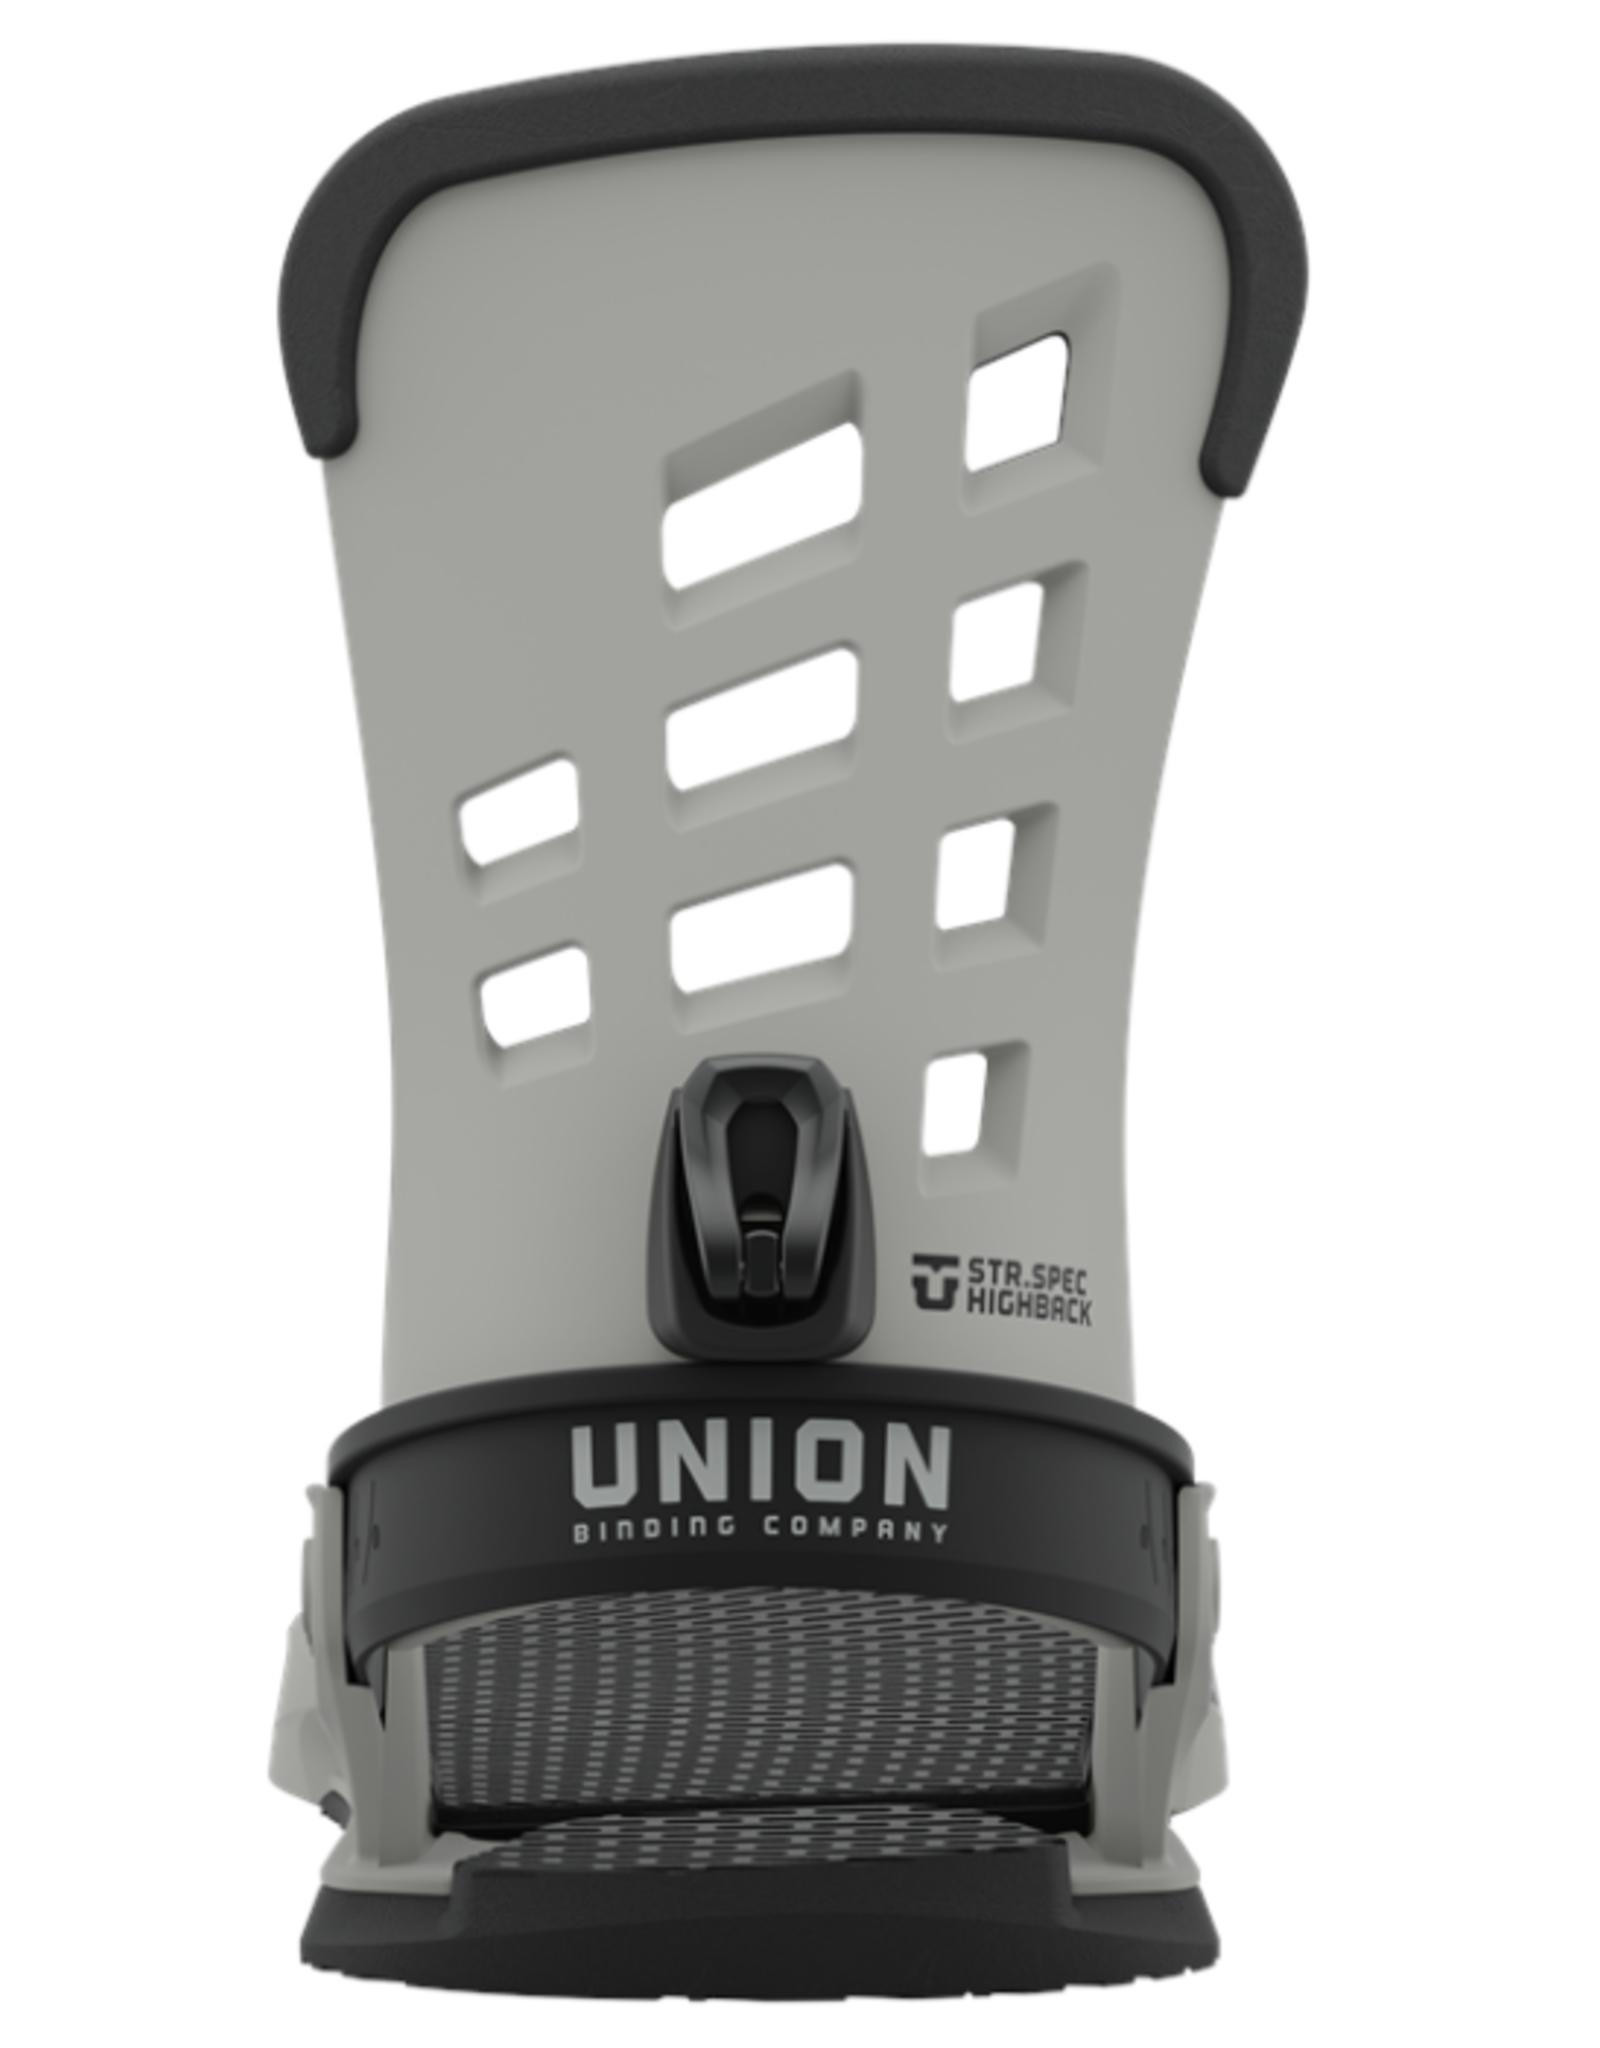 UNION Union Men's STR Bindings Stone 2022